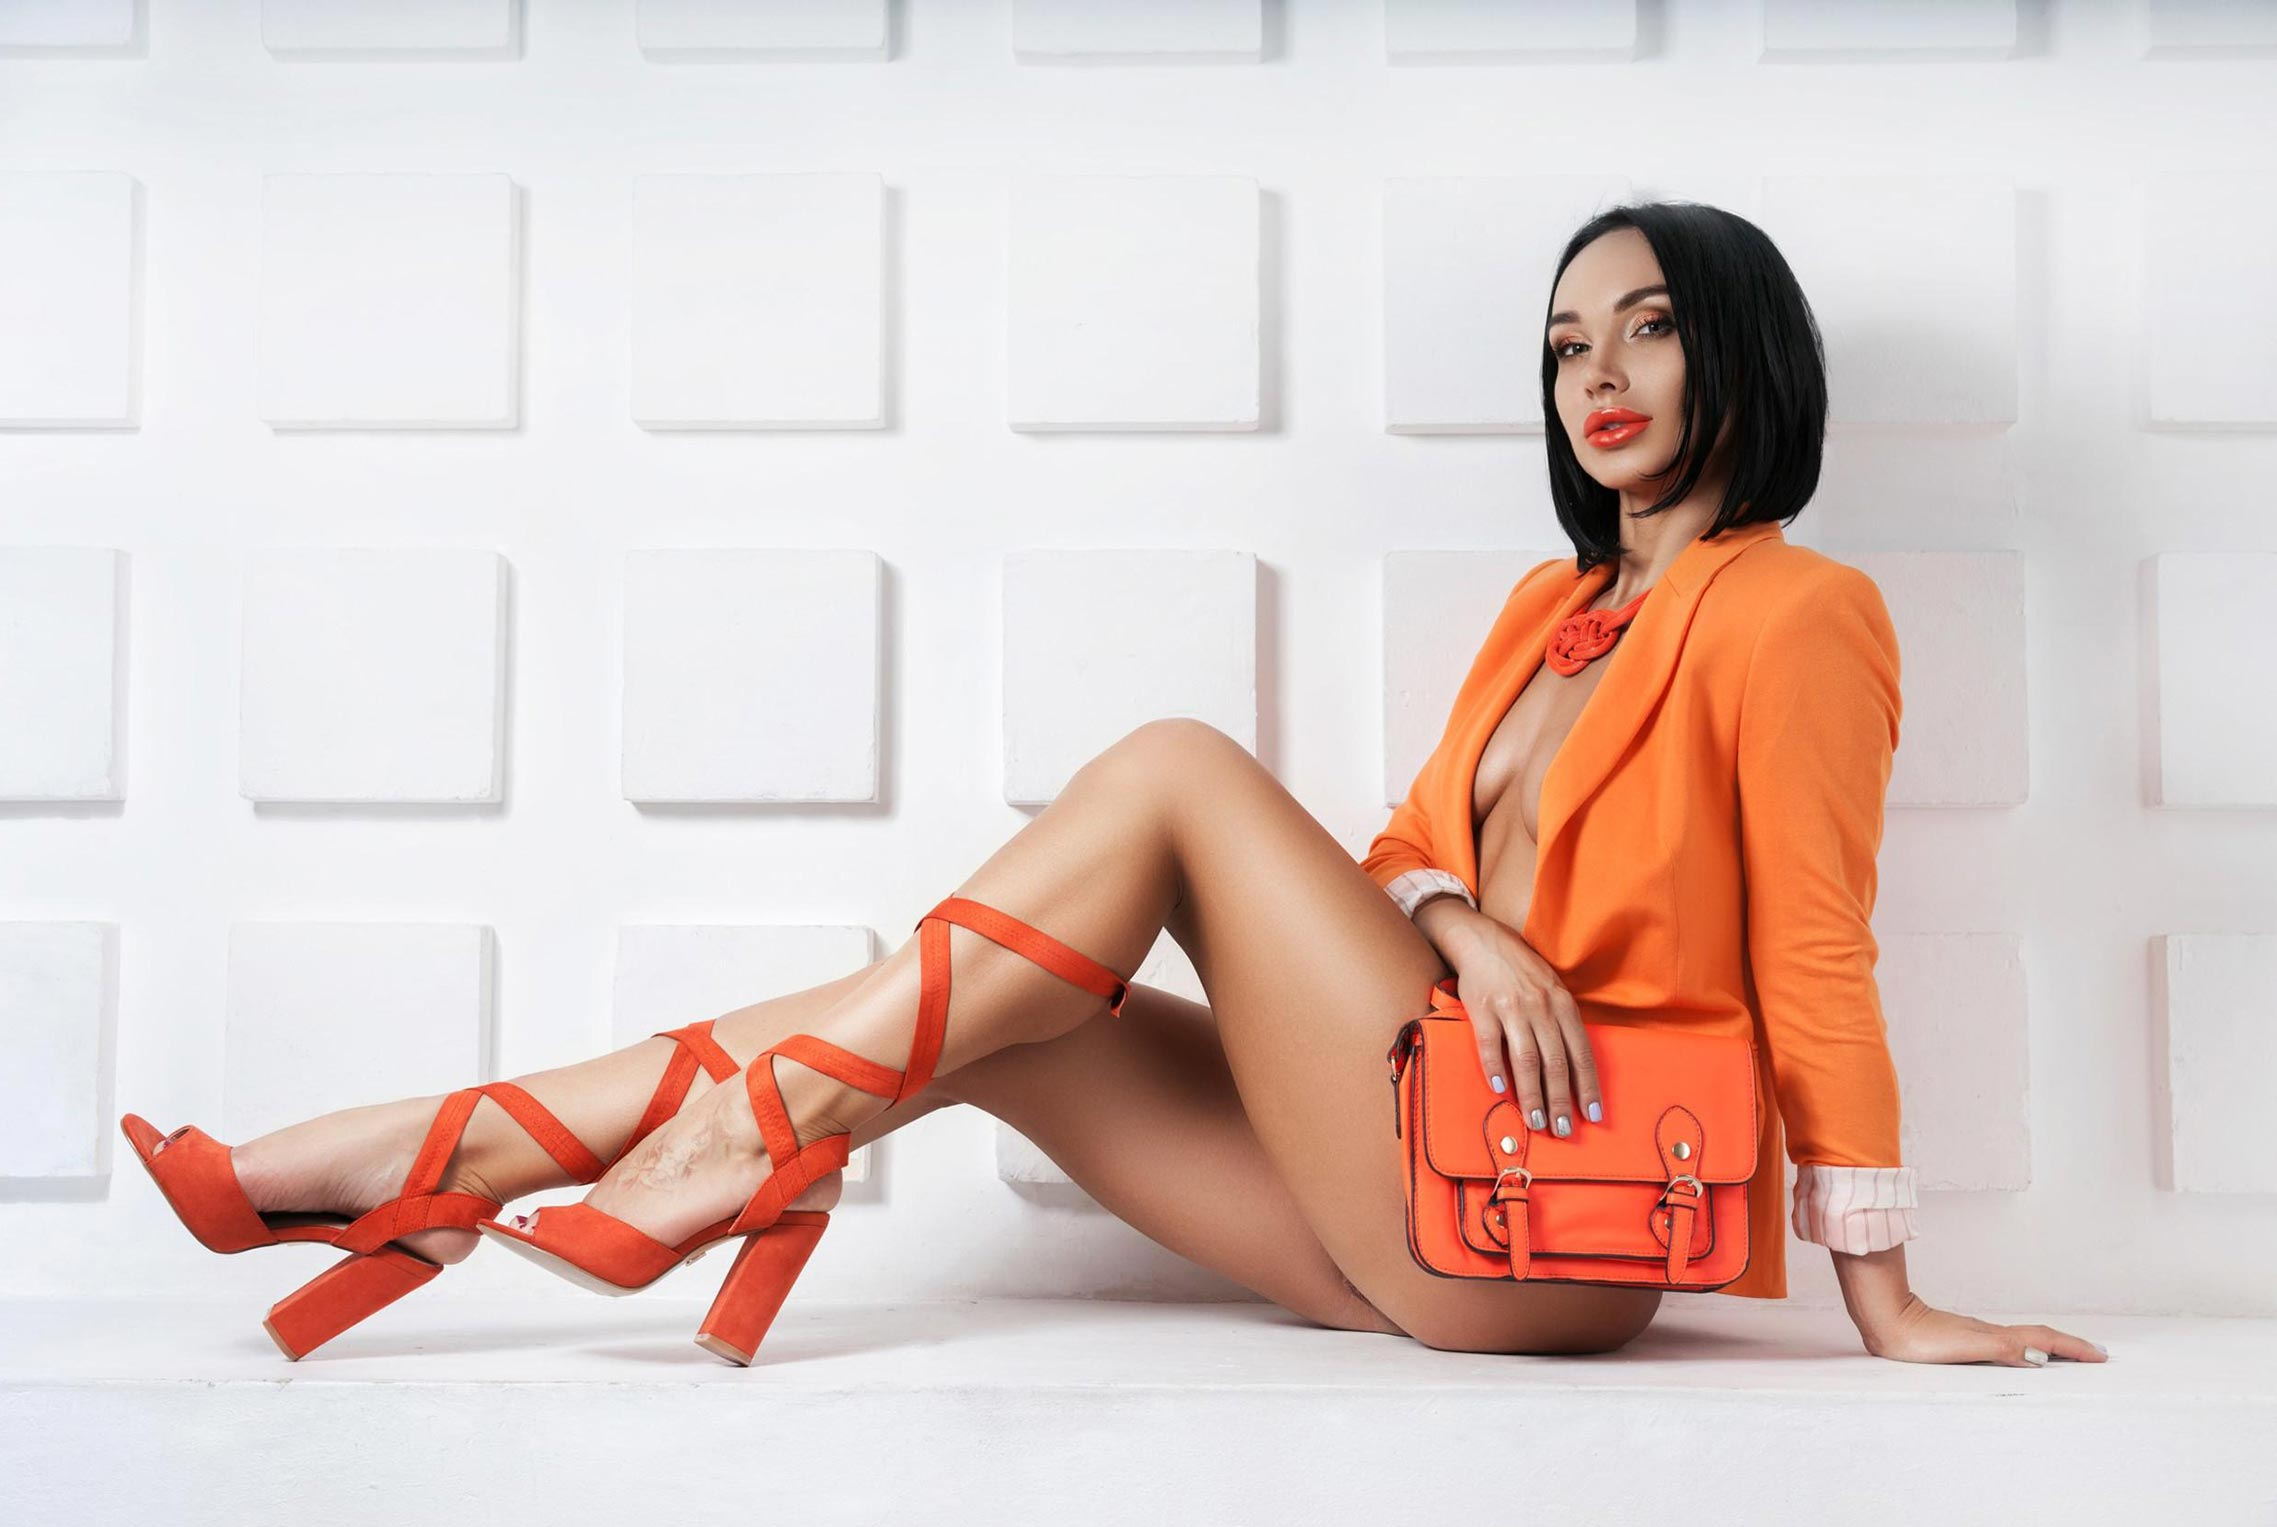 Олеся Левина и оранжевая мода / фото 01